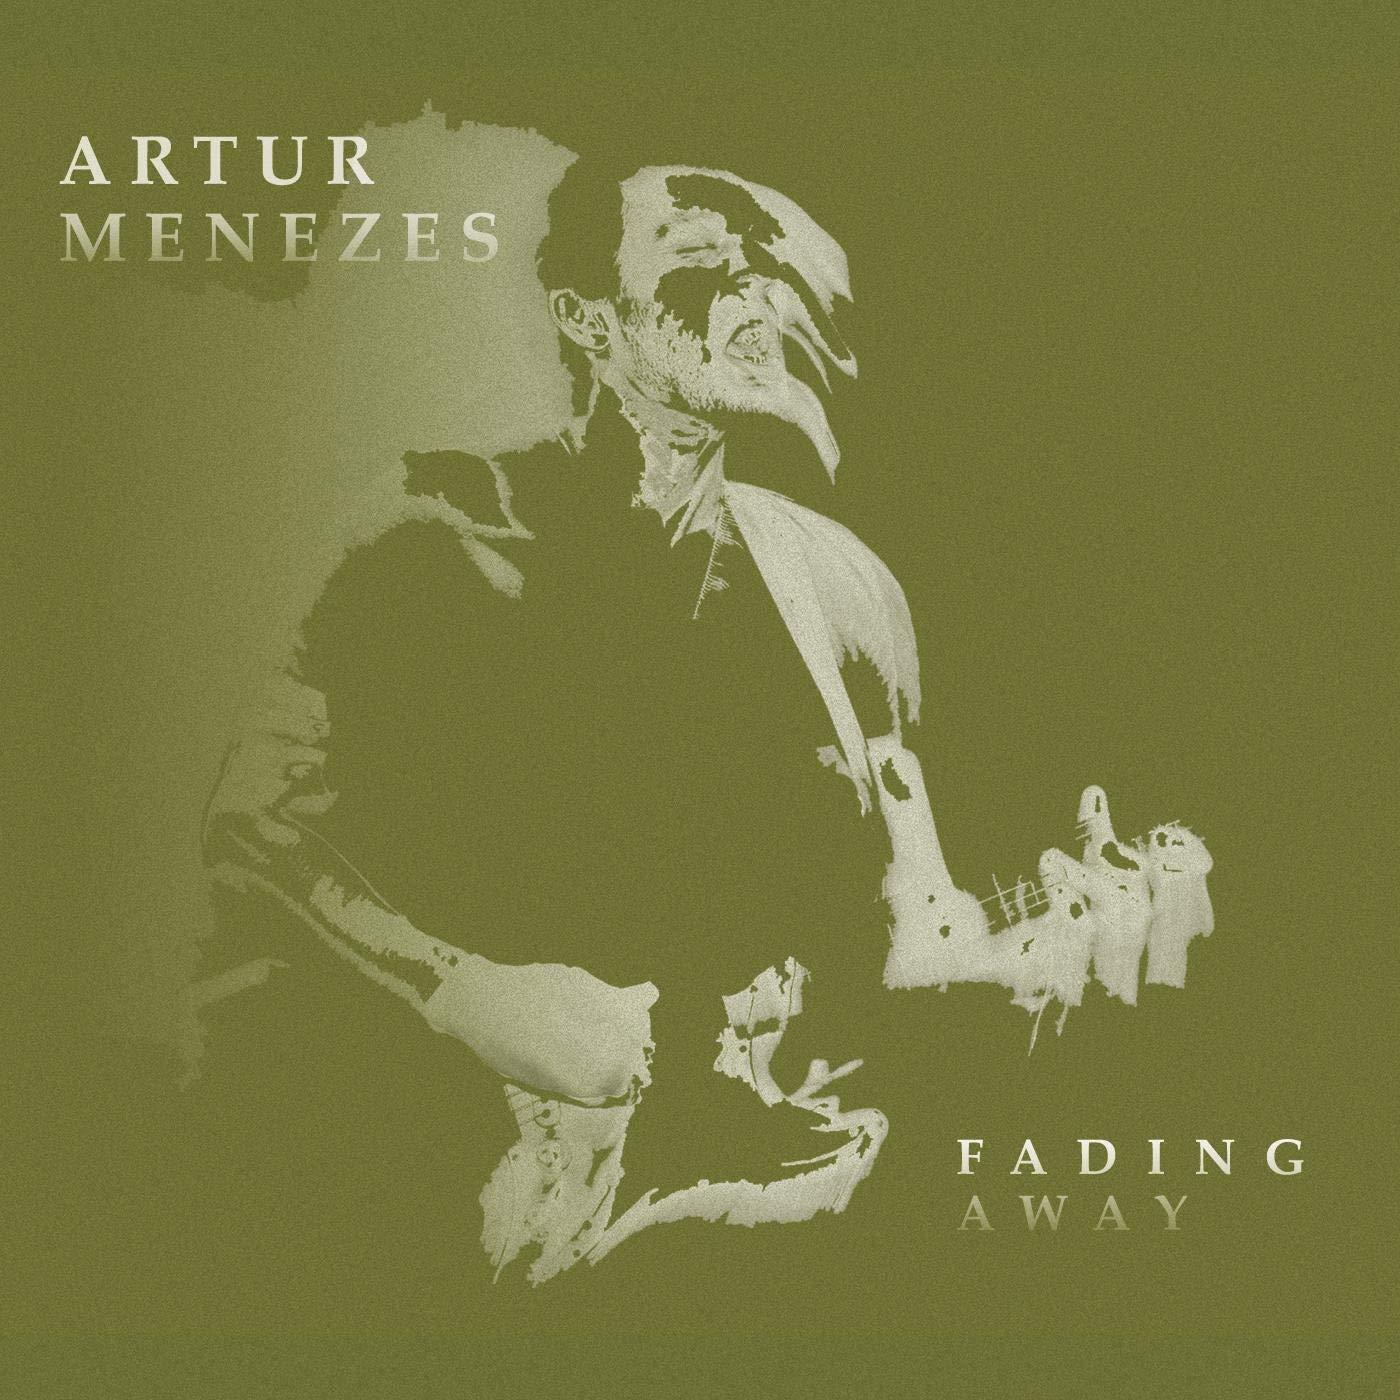 ARTUR MENEZES - Fading Away